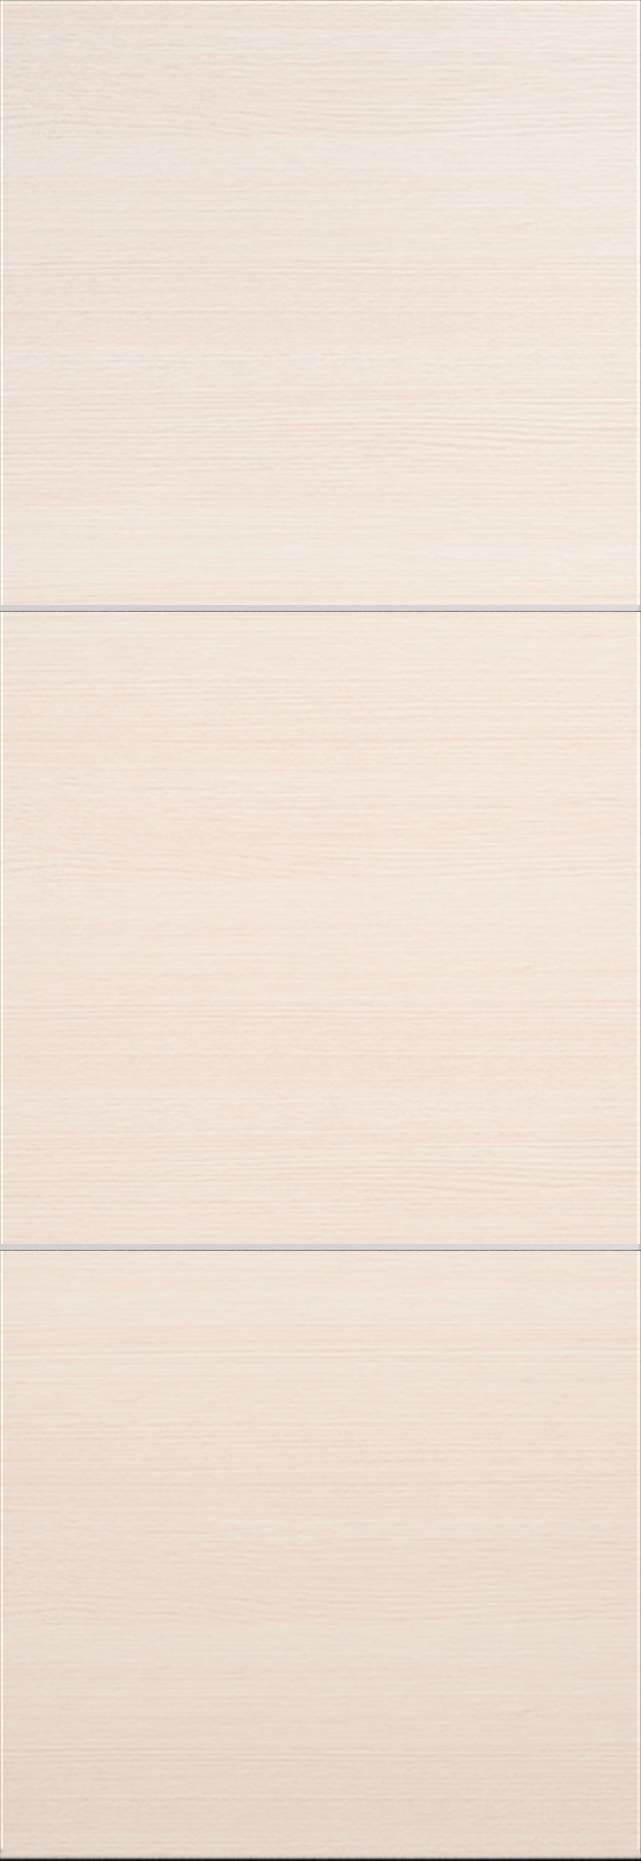 Tivoli В-3 Invisible цвет - Беленый дуб Без стекла (ДГ)